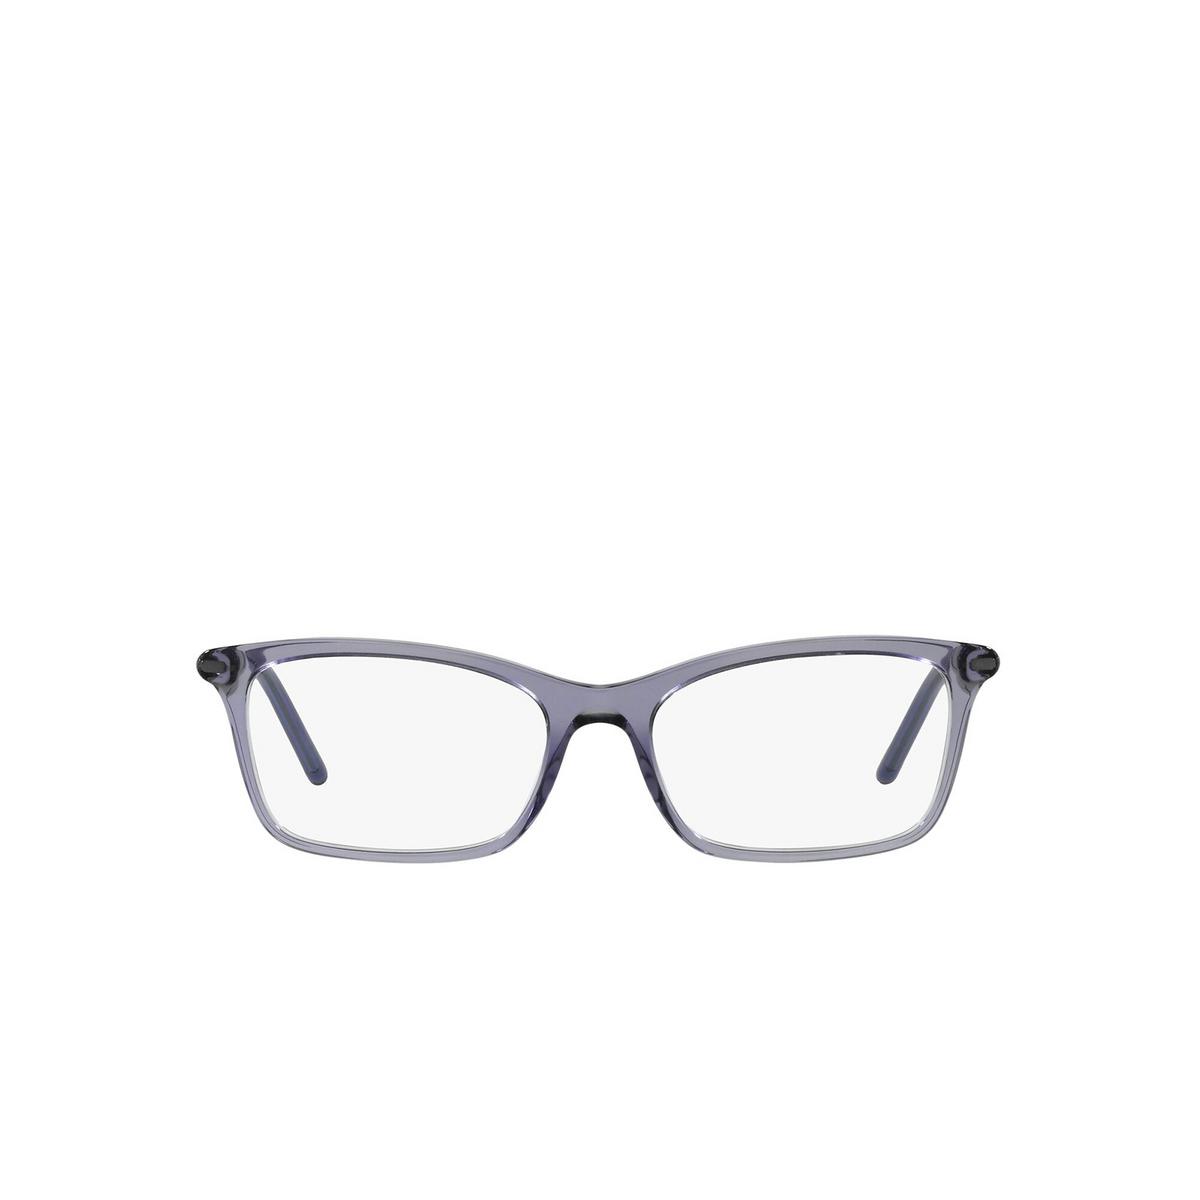 Prada® Rectangle Eyeglasses: PR 16WV color Bluette Crystal 06M1O1 - front view.